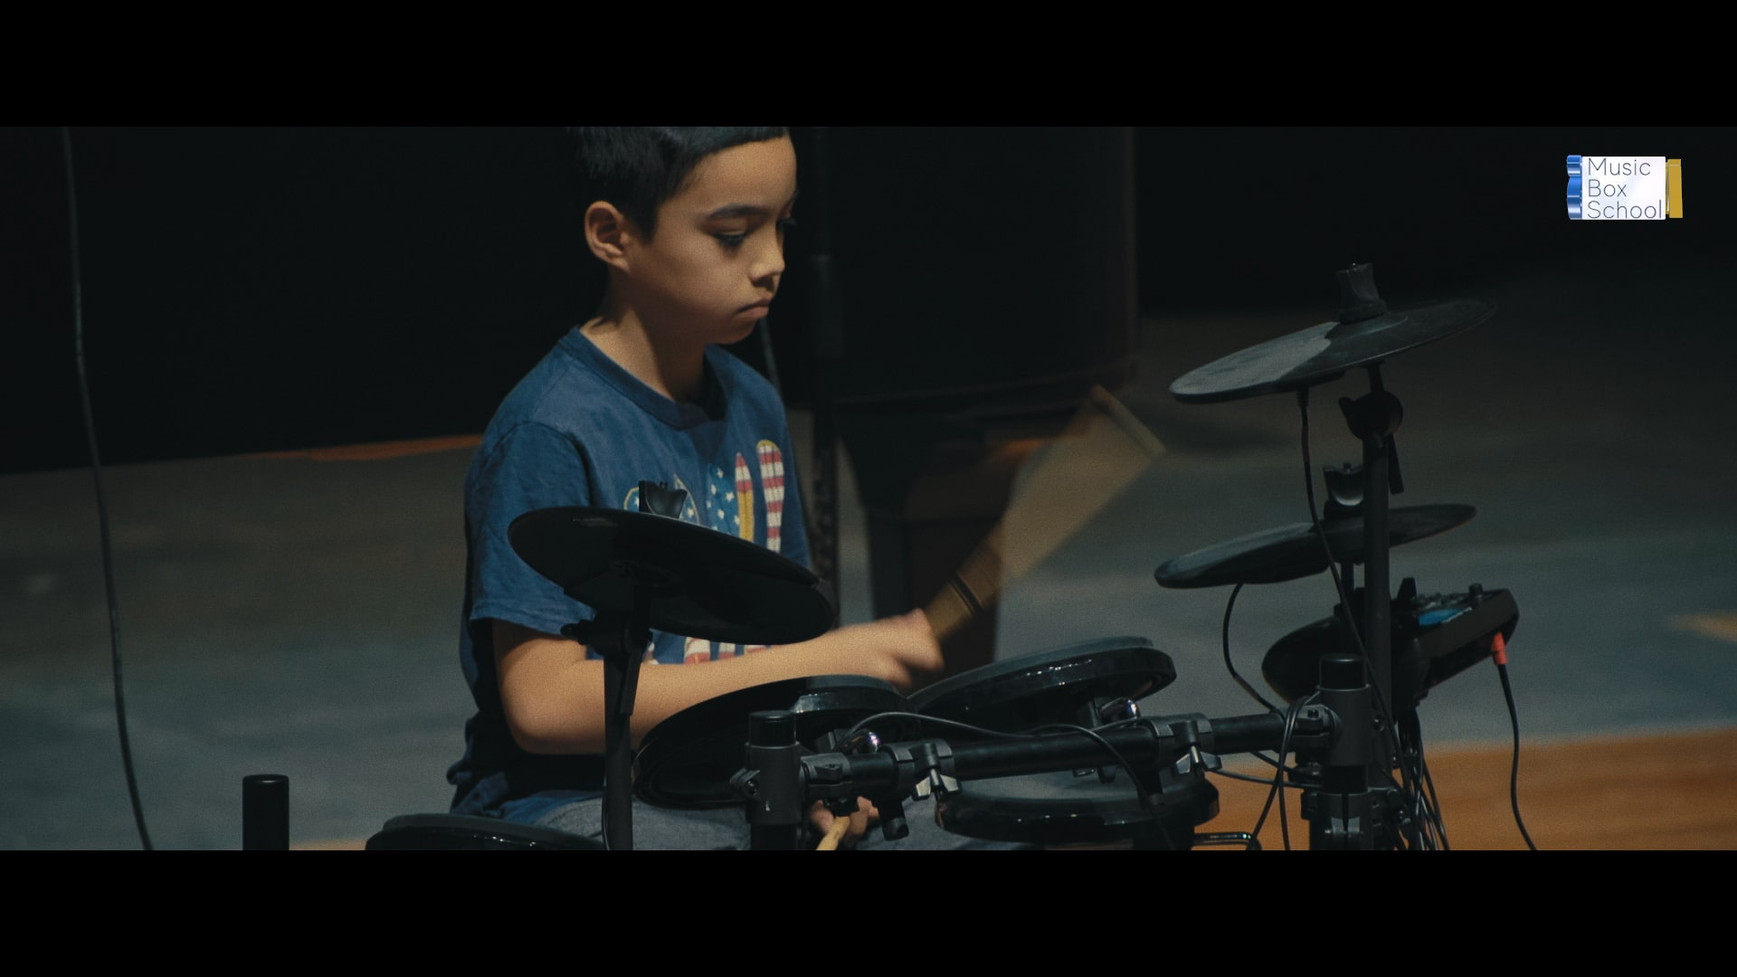 Drums lessons in Sheepshead Bay, Brooklyn